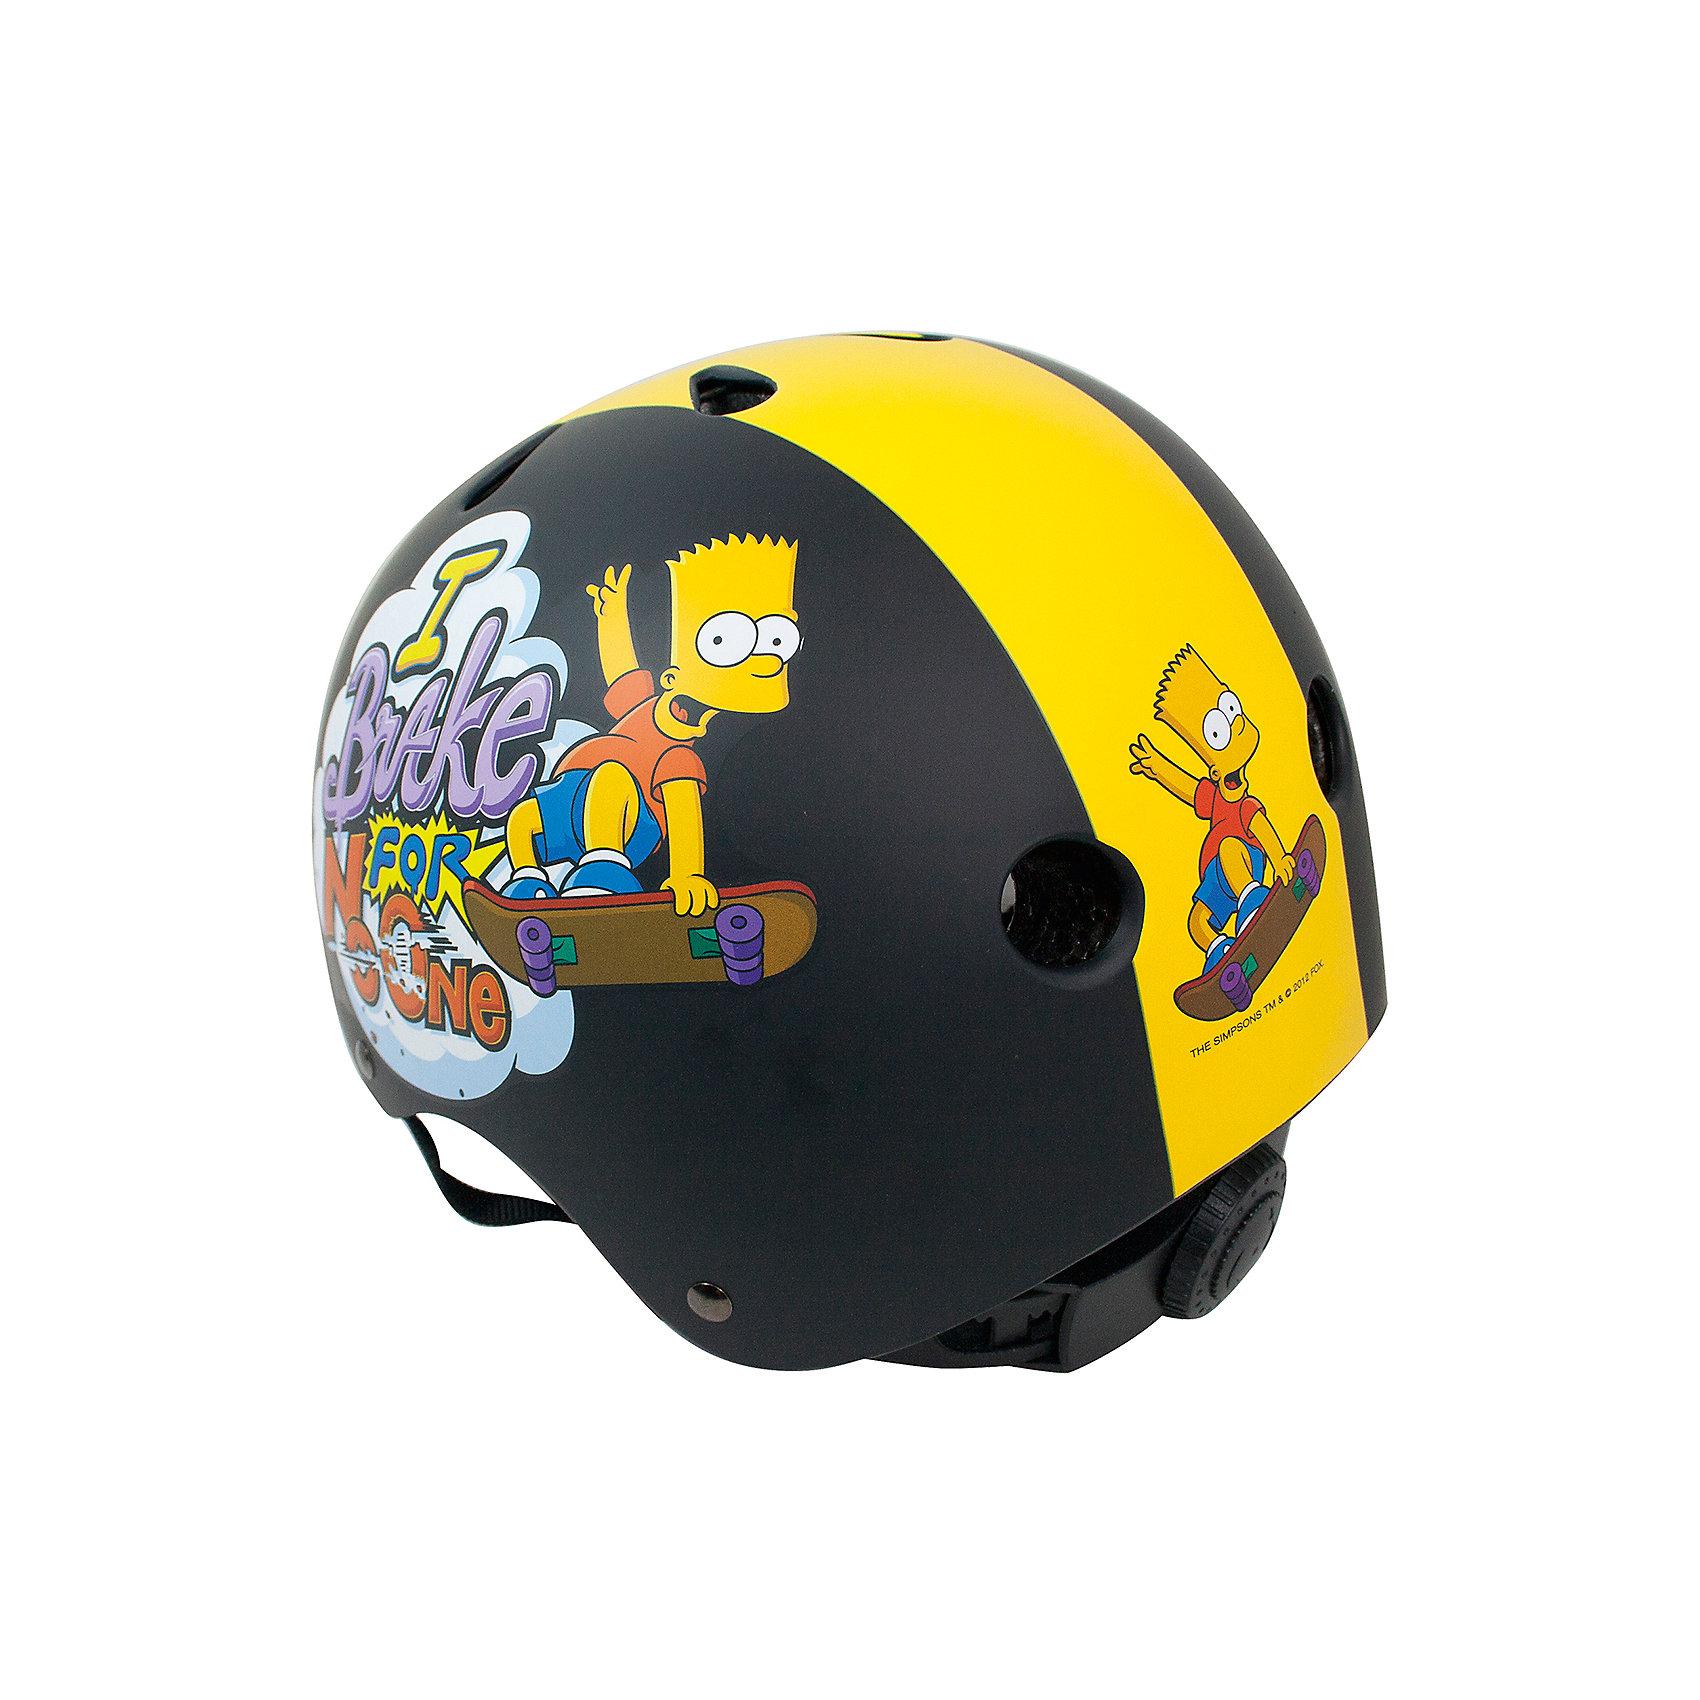 Neu Simpsons Bart Bart Bart Fahrradhelm Gr. 48-54 cm schwarz 6970146 schwarz c24fe6